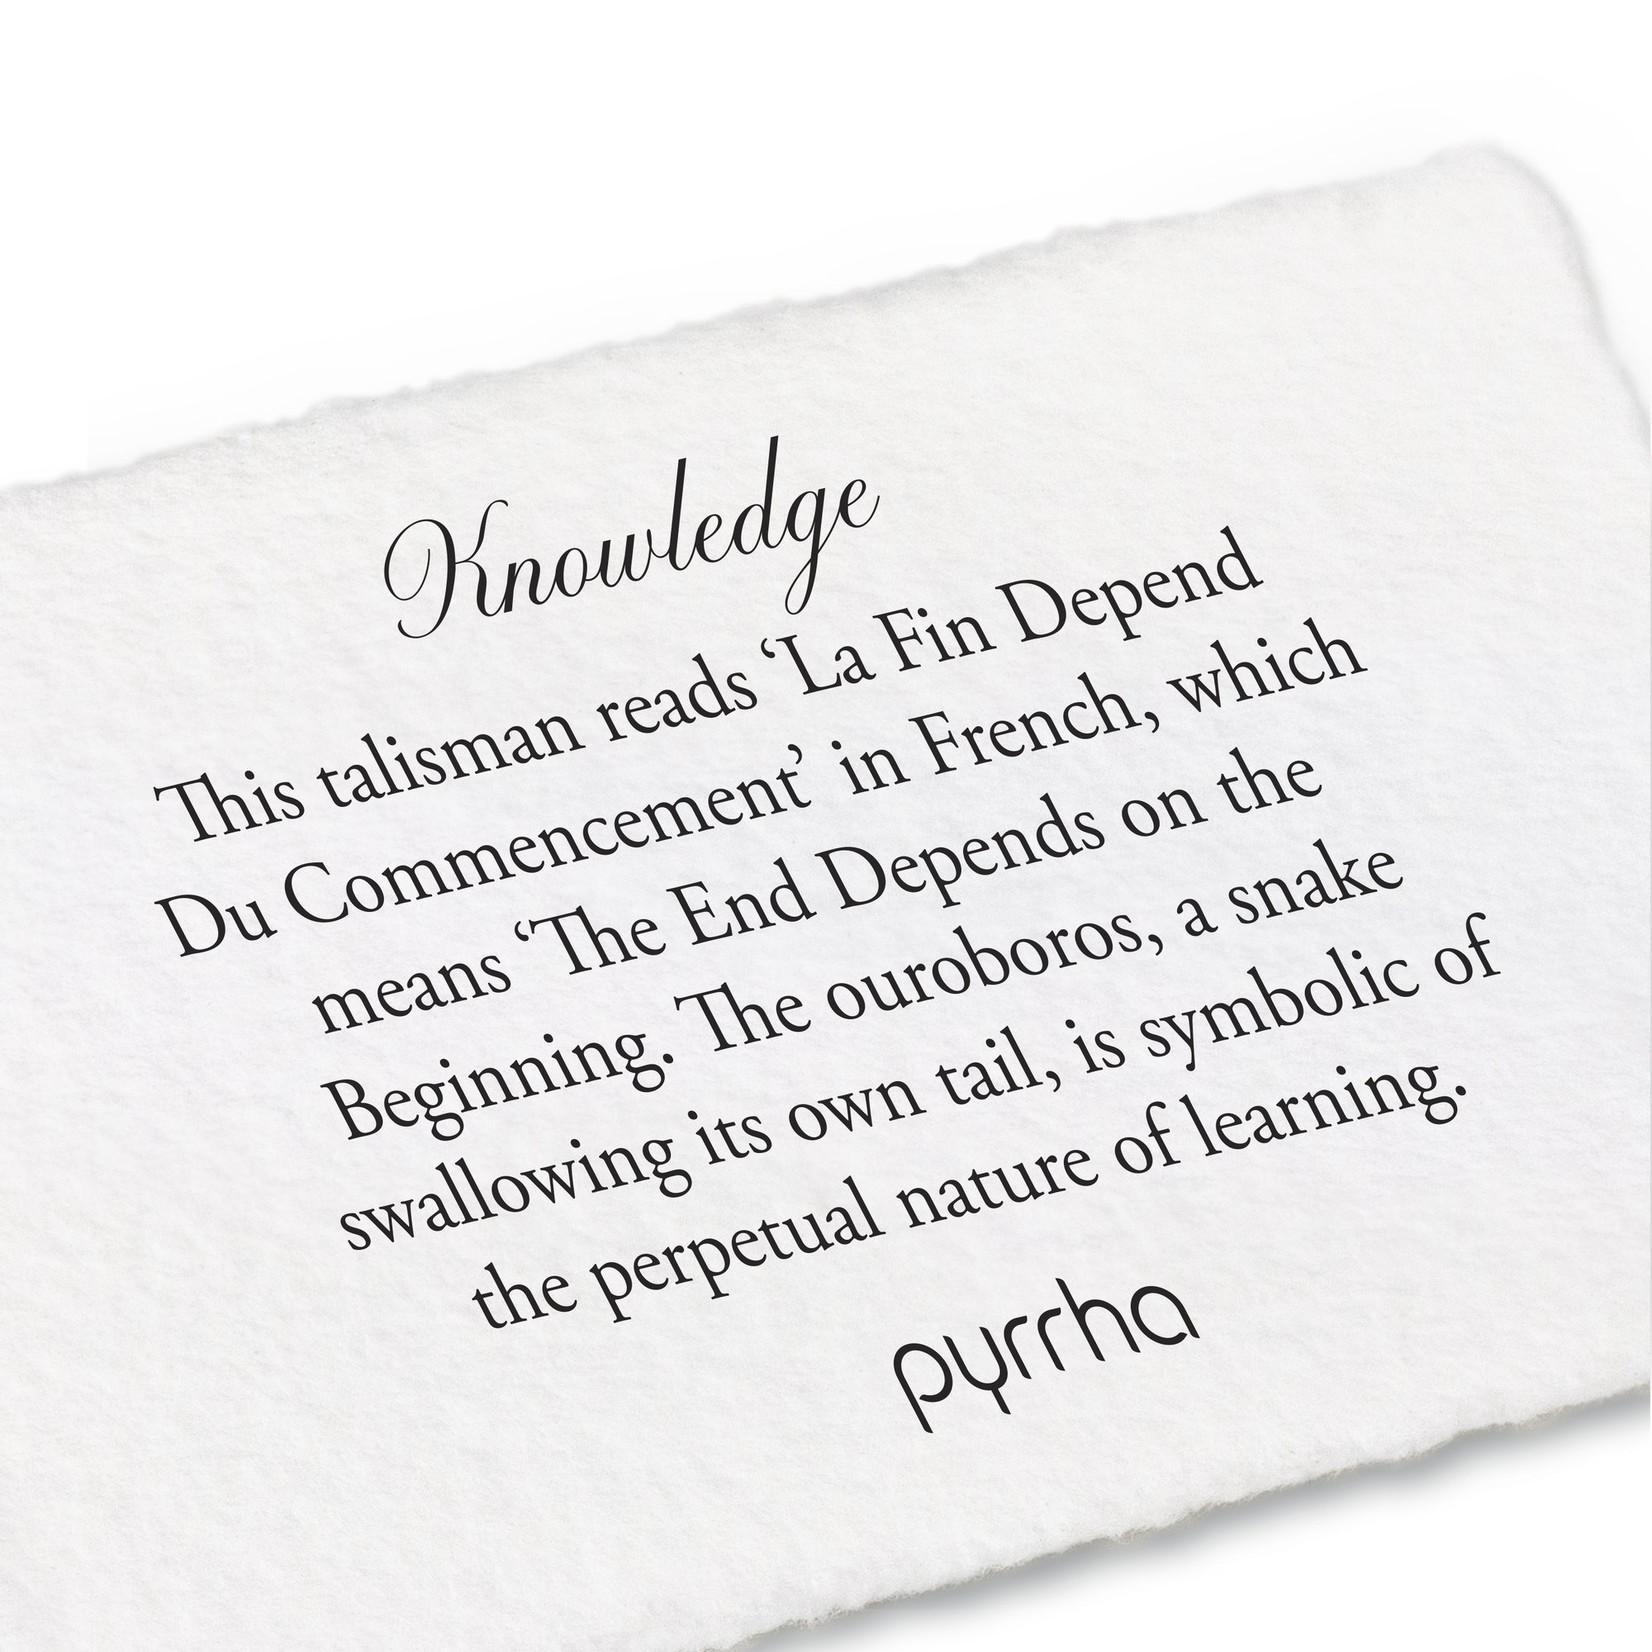 Pyrrha Knowledge Signature Talisman